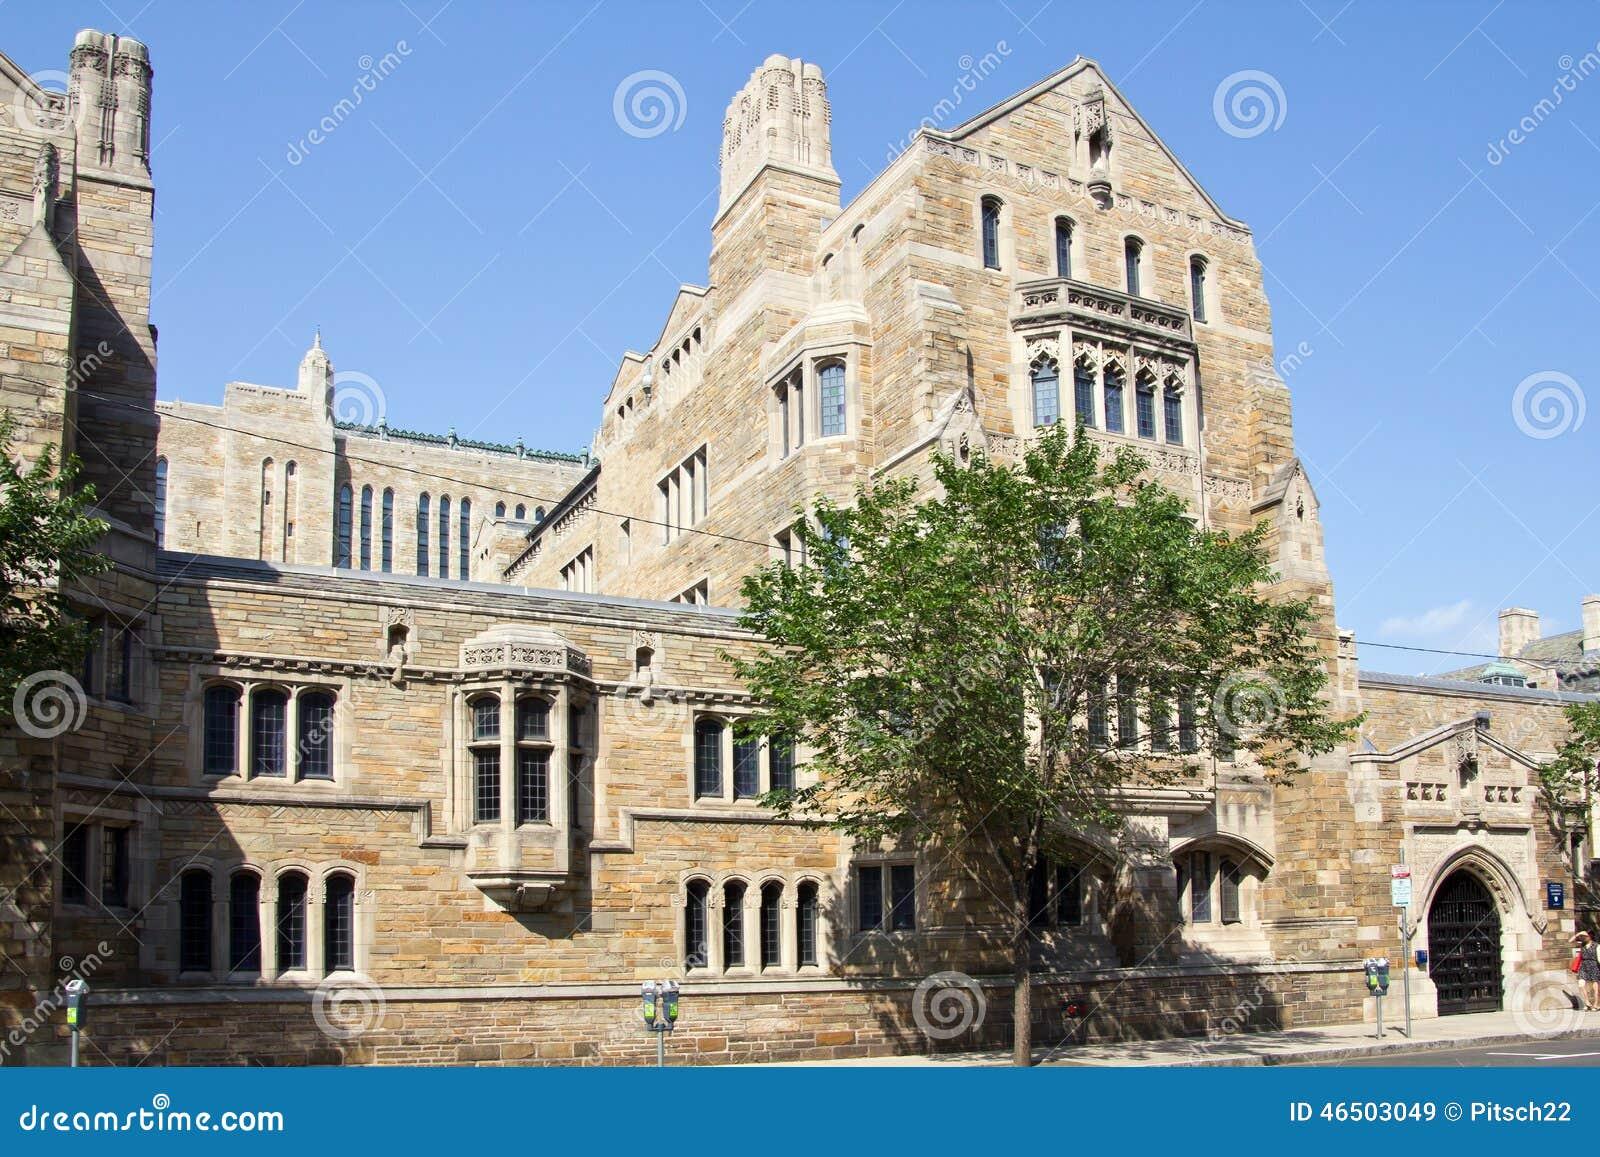 New Haven, Yale University